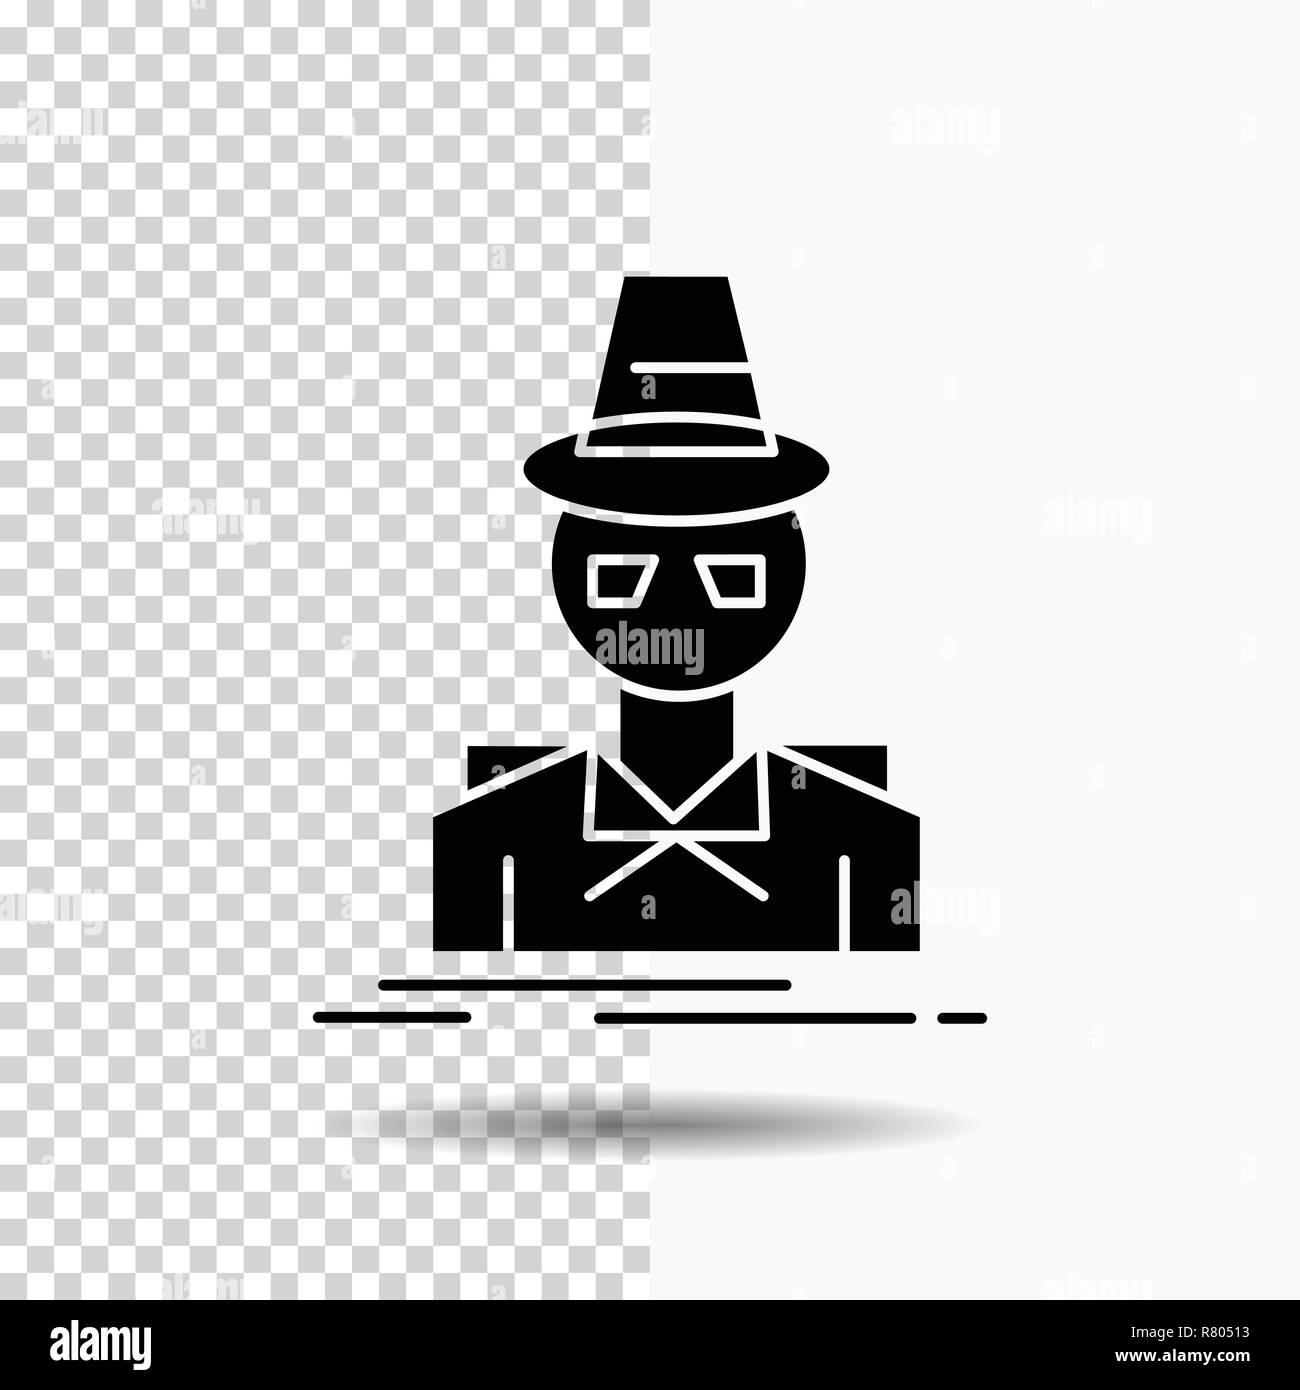 Detective Hacker Incognito Spy Thief Glyph Icon On Transparent Background Black Icon Stock Vector Image Art Alamy